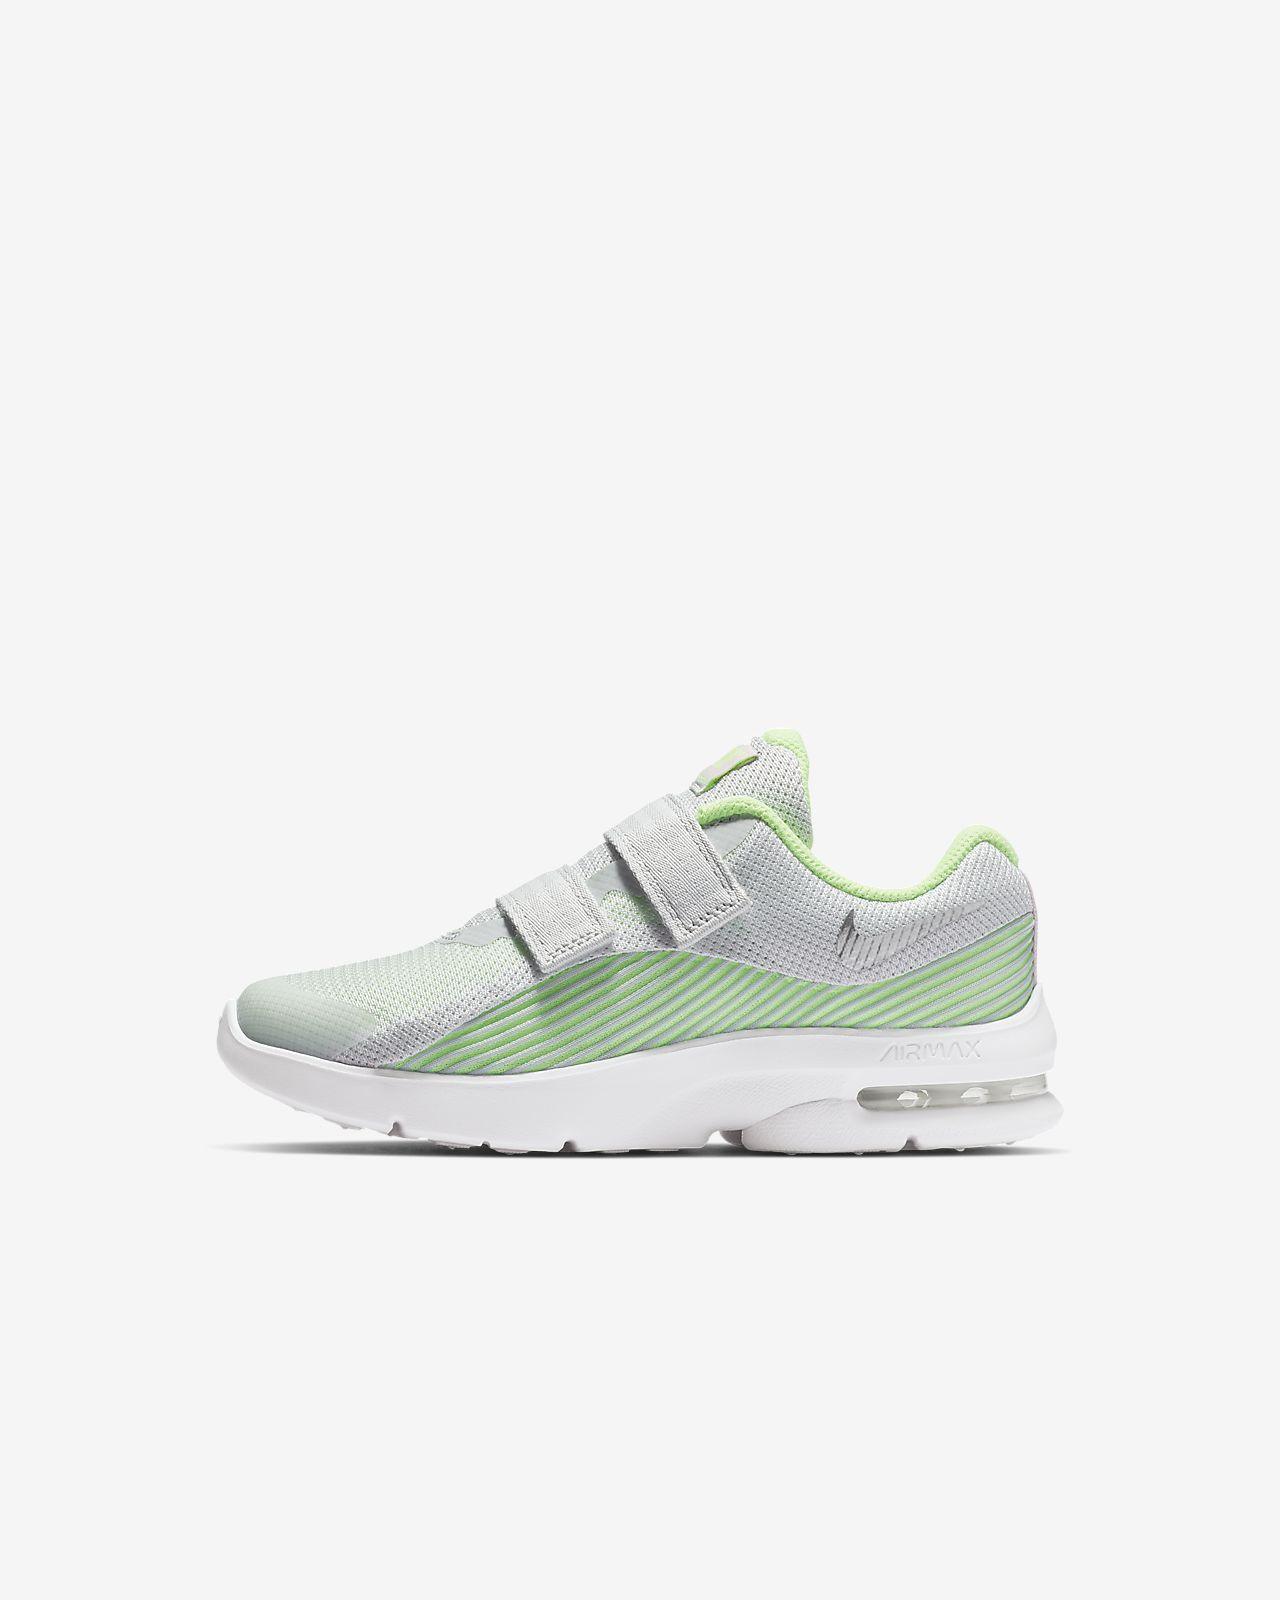 Nike Air Max Advantage 2 (PSV) 幼童运动童鞋